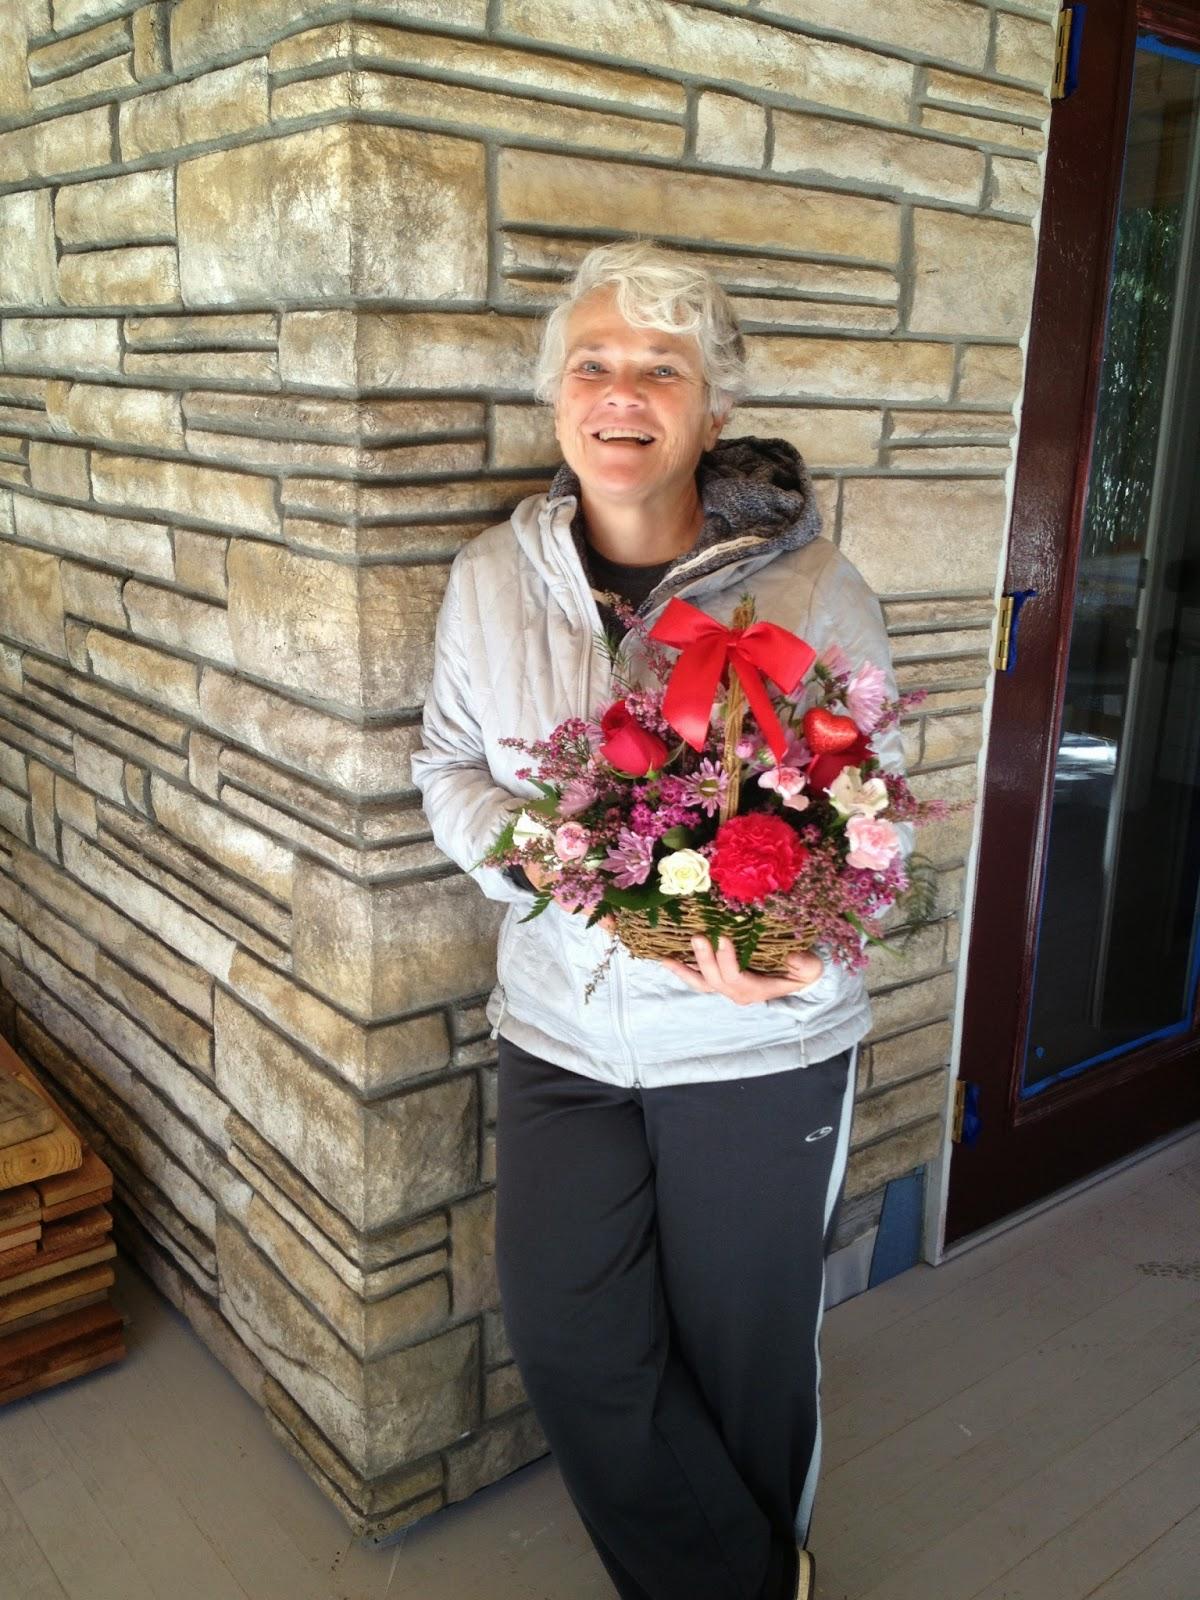 Nanette Gregory Flowers